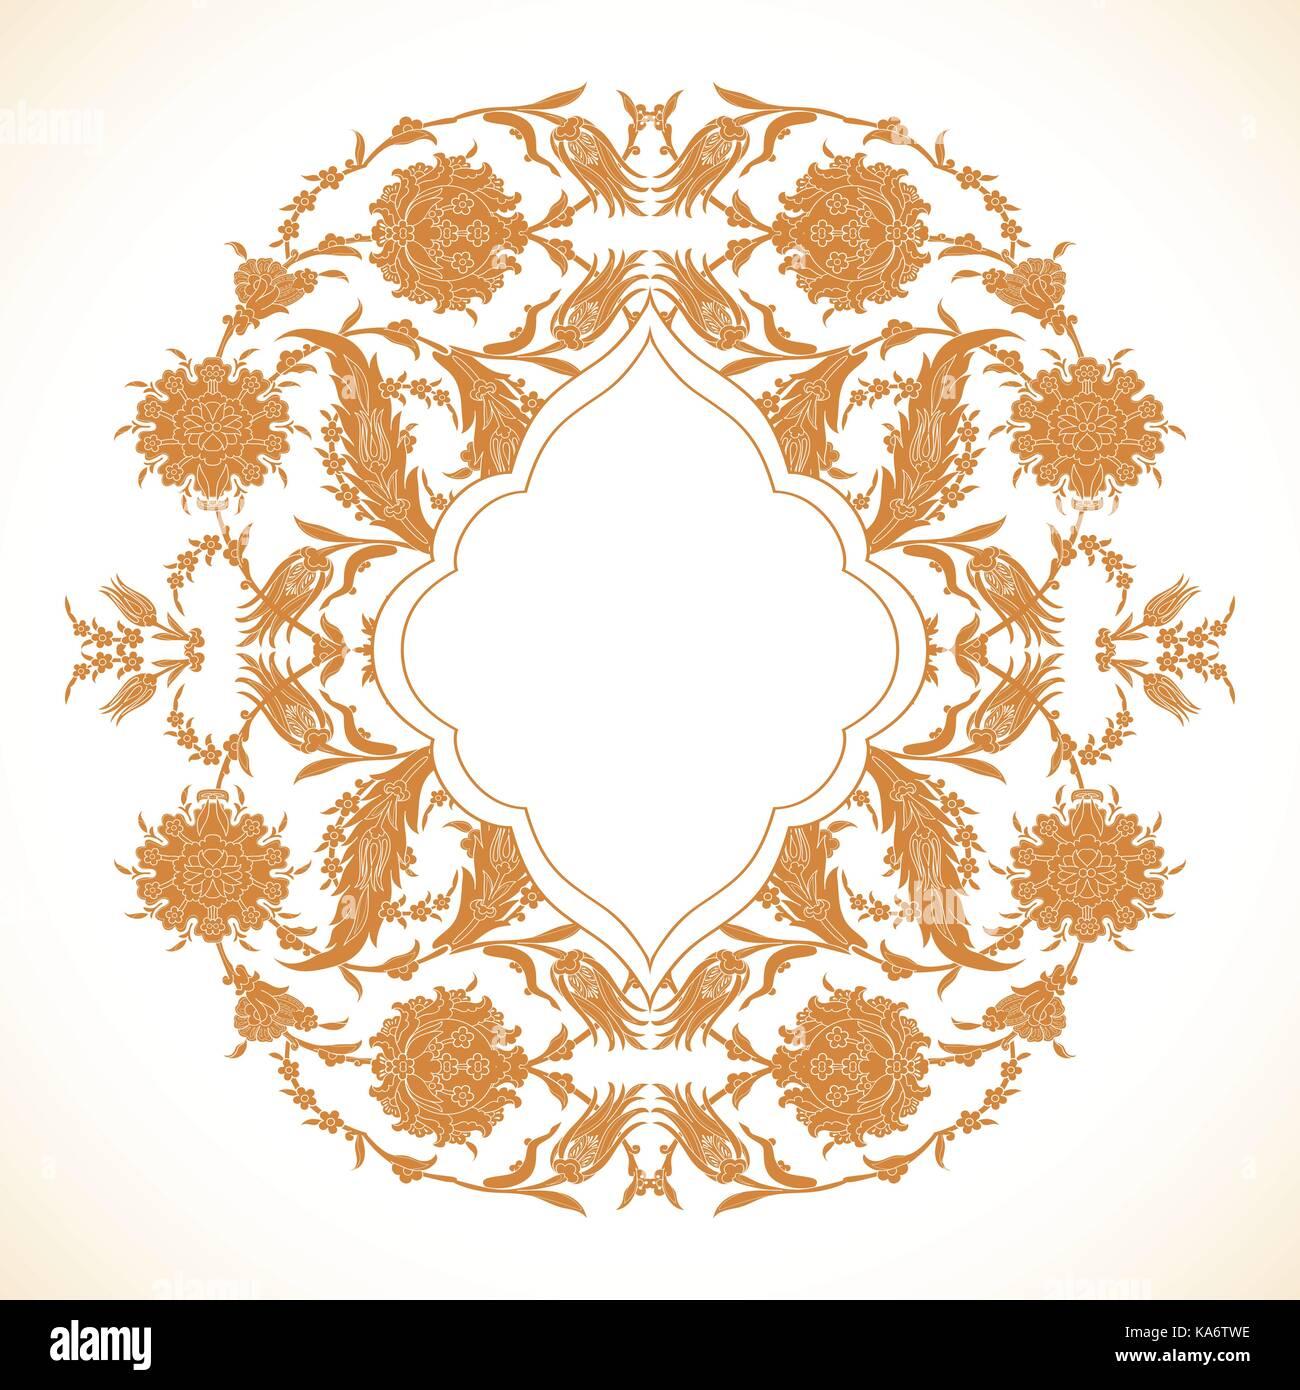 Arabesque vintage gold decor ornate pattern for design template ...